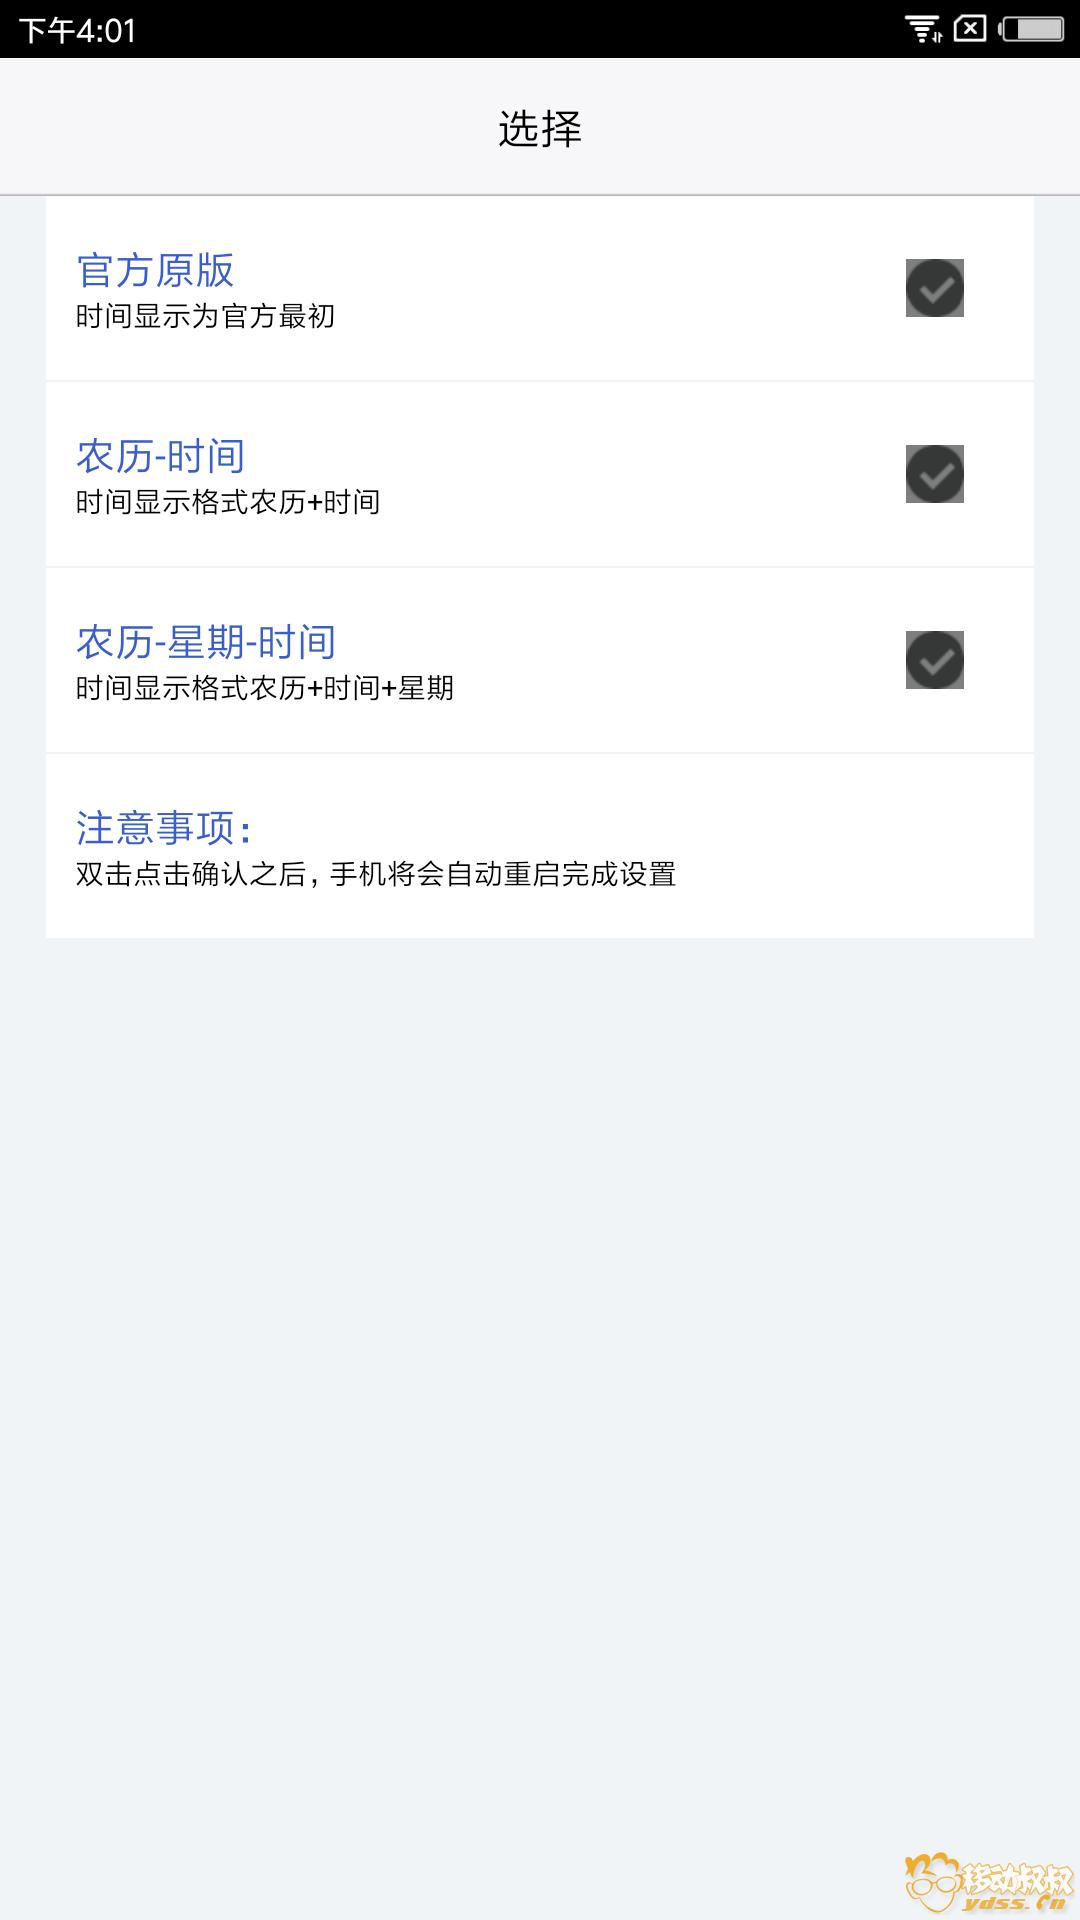 Screenshot_2018-04-10-16-01-44-776_com.pingfan.settings.png